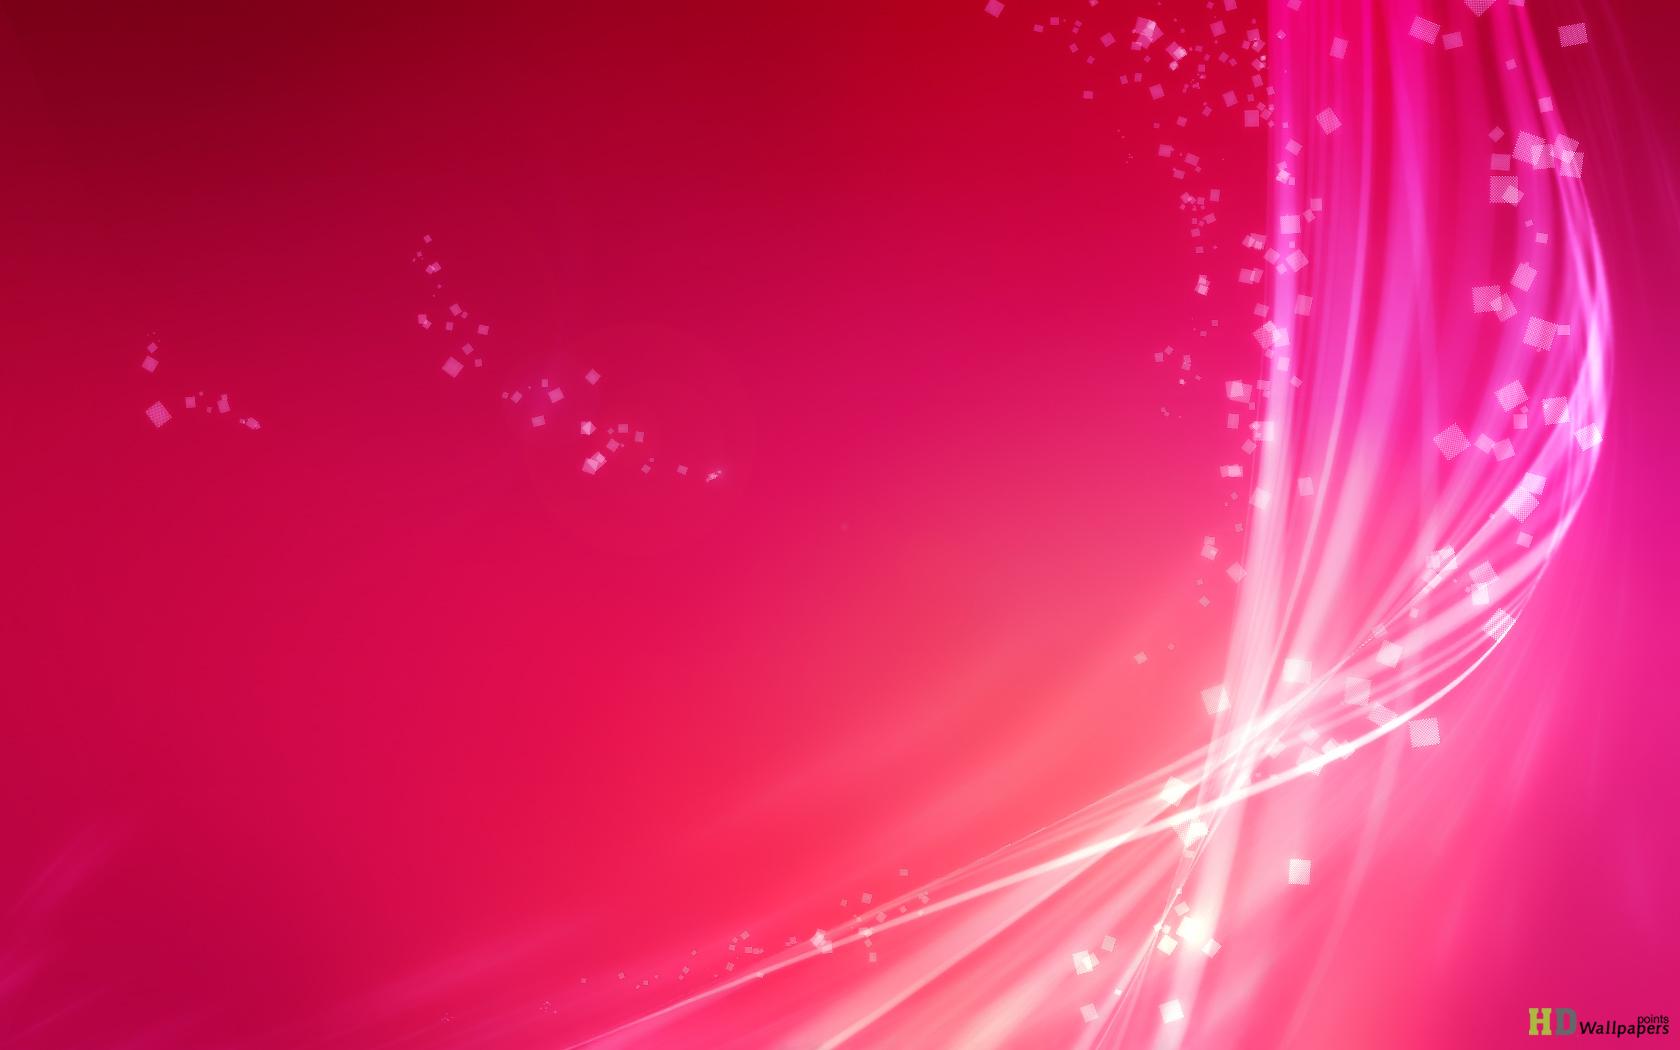 Pink Background HD Wallpaper 1680x1050